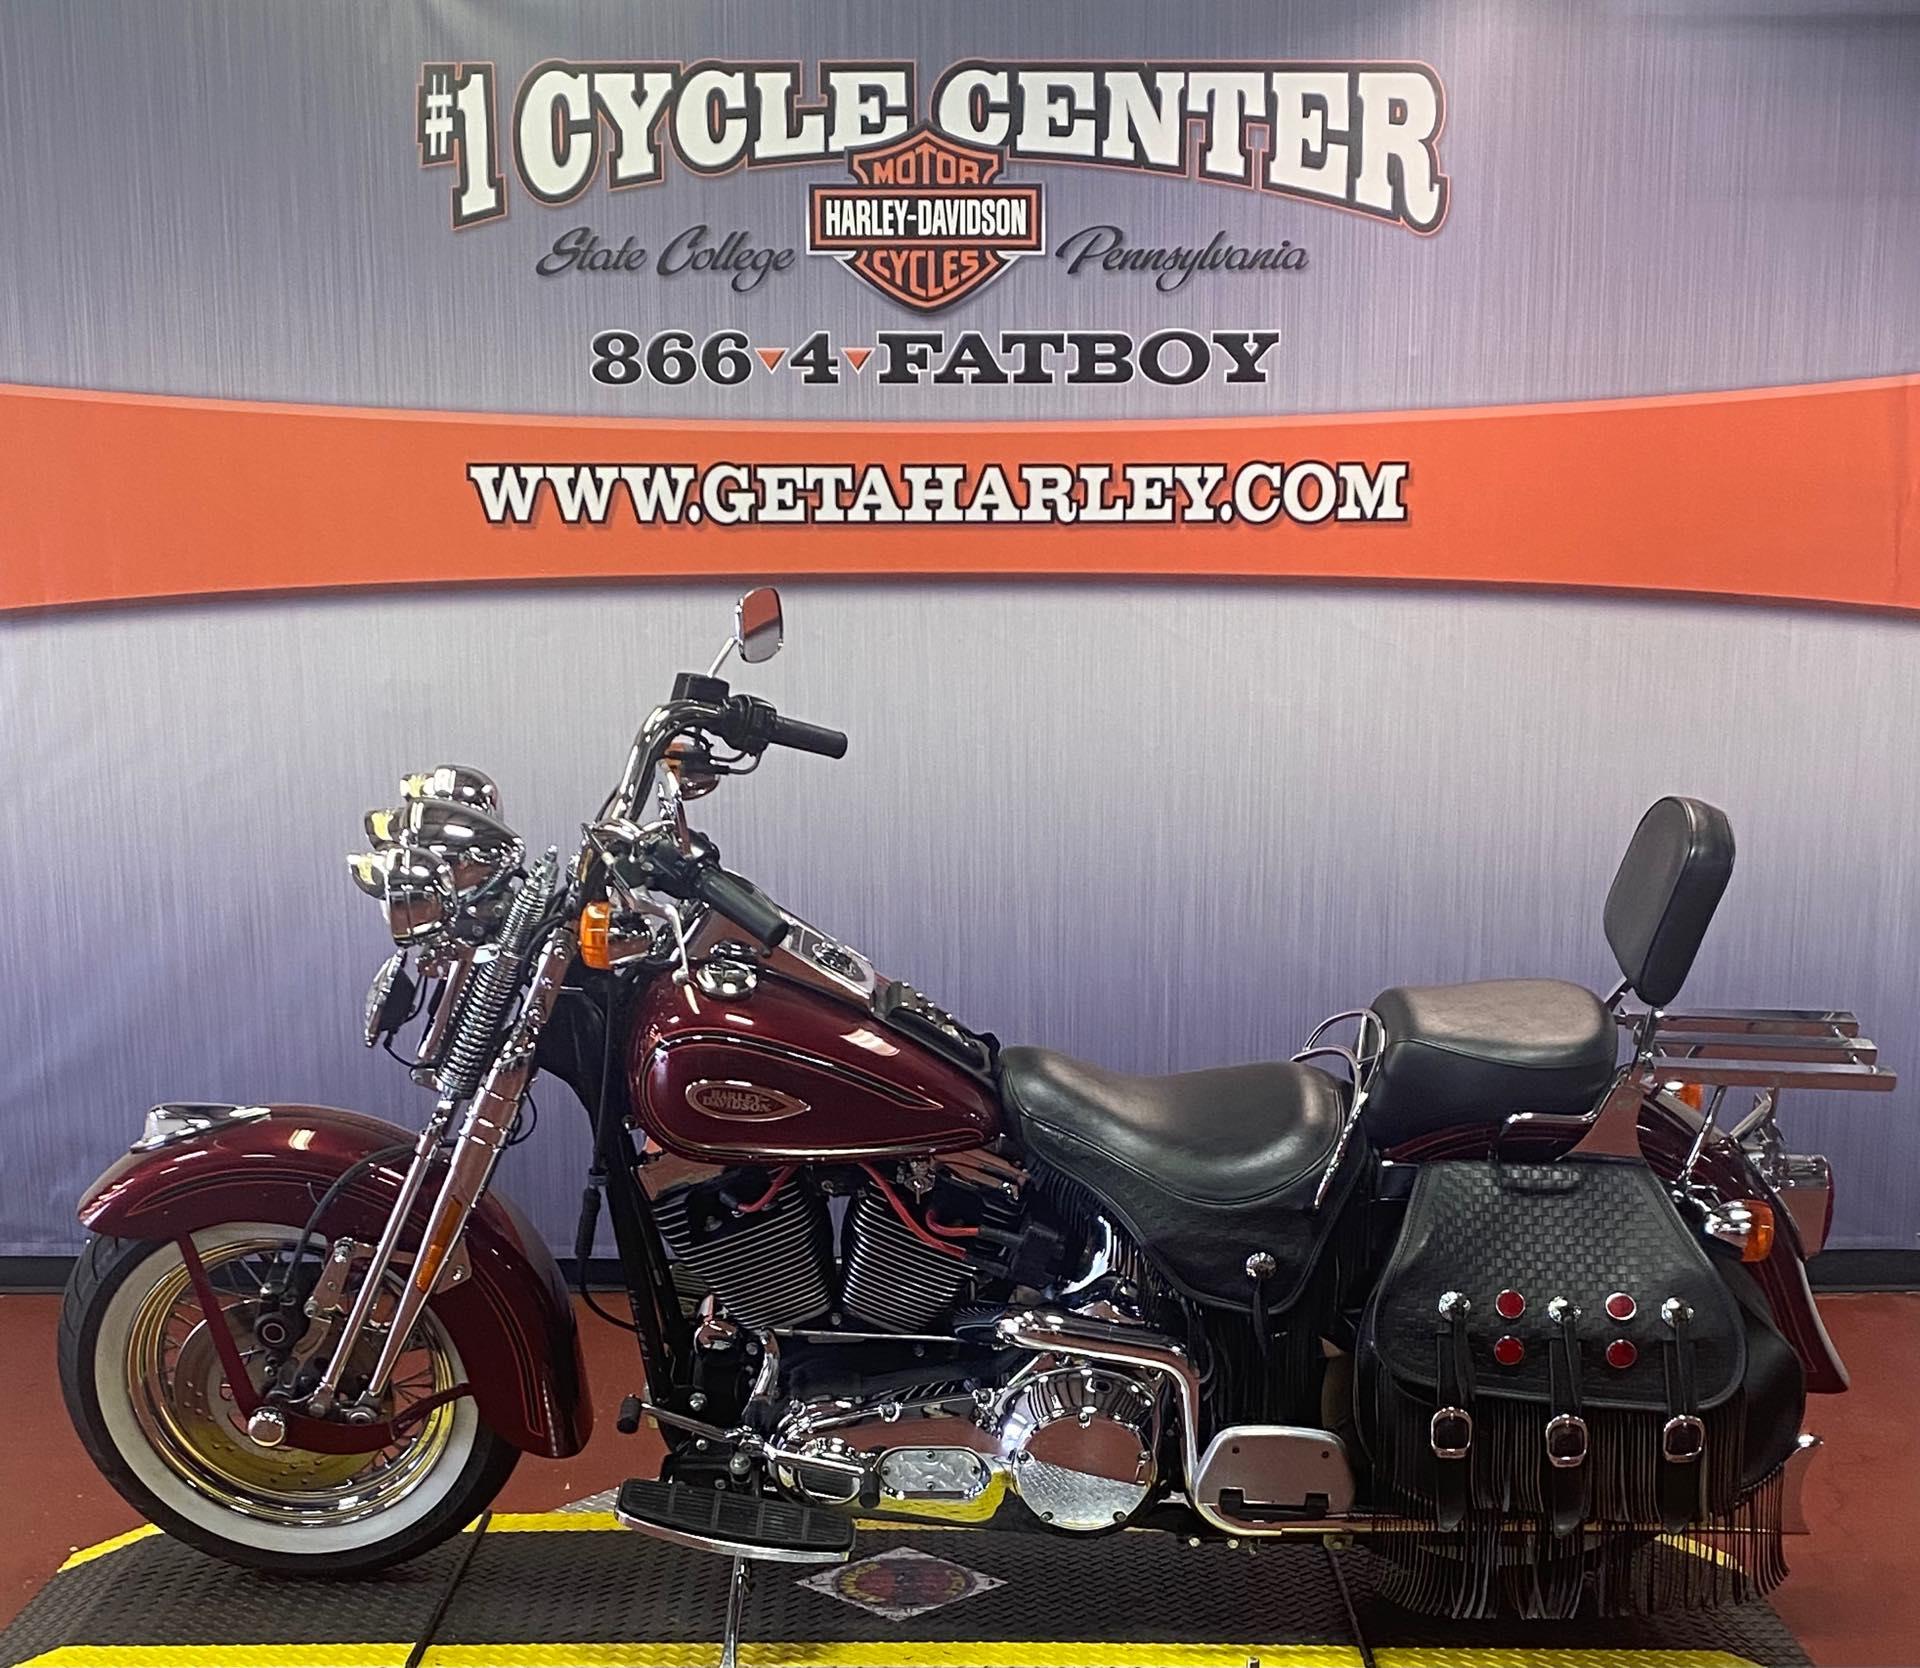 2000 Harley-Davidson FLSTS at #1 Cycle Center Harley-Davidson